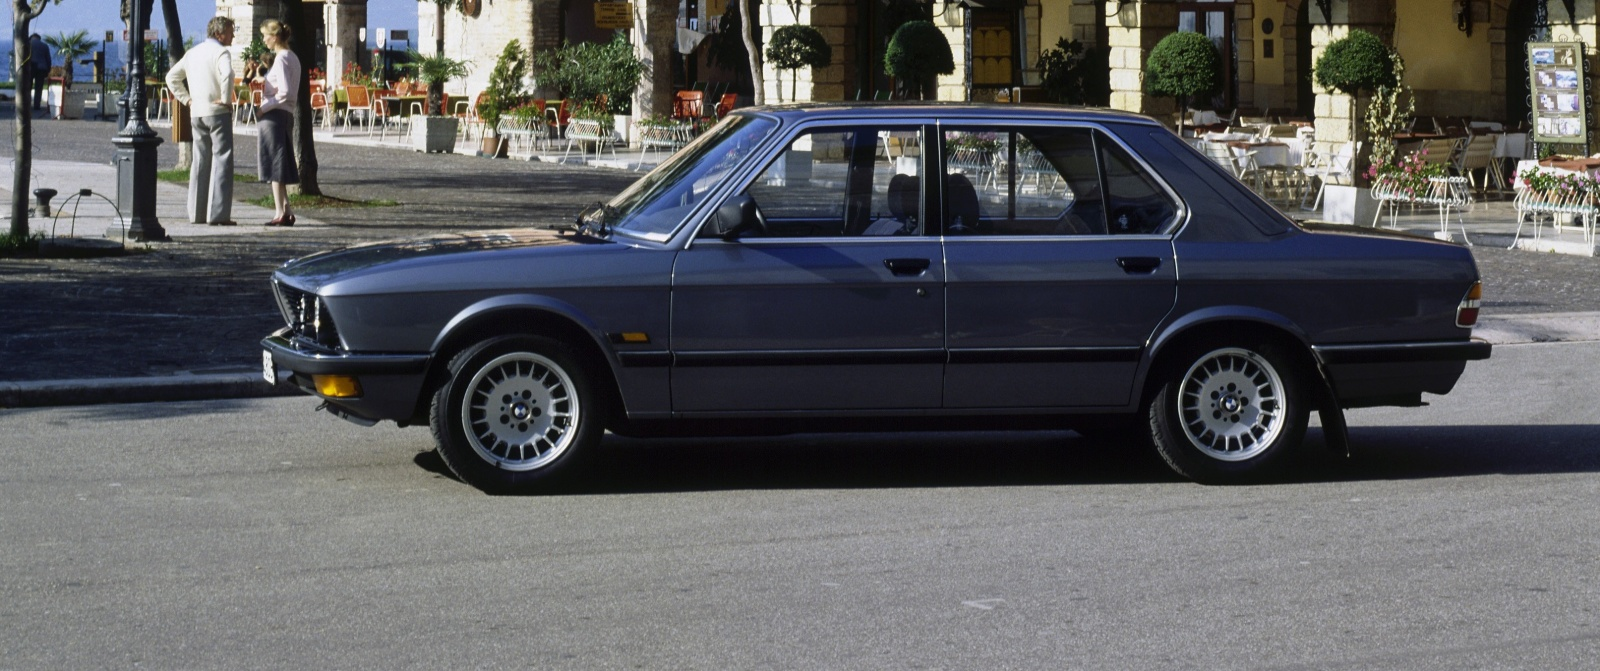 BMW serii 5 E28 - bok, profil 528i